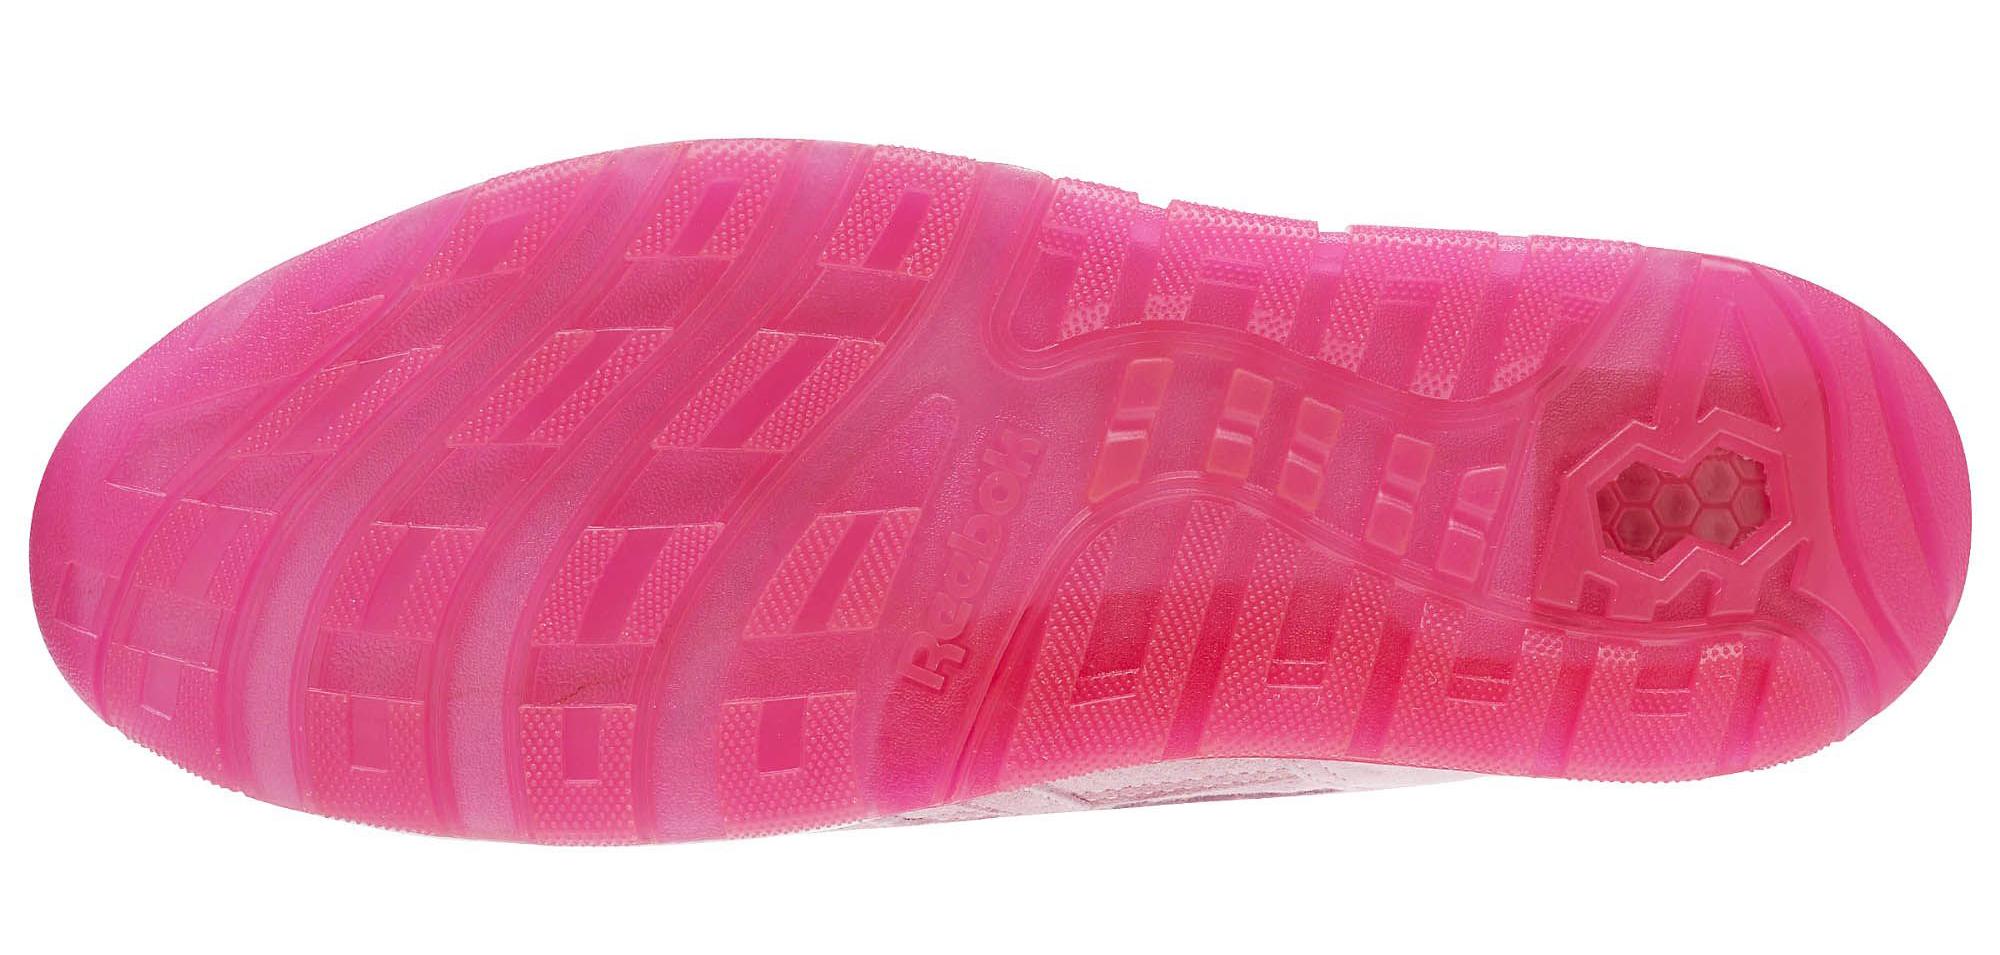 Camron Reebok Ventilator Pink Fleebok Sole